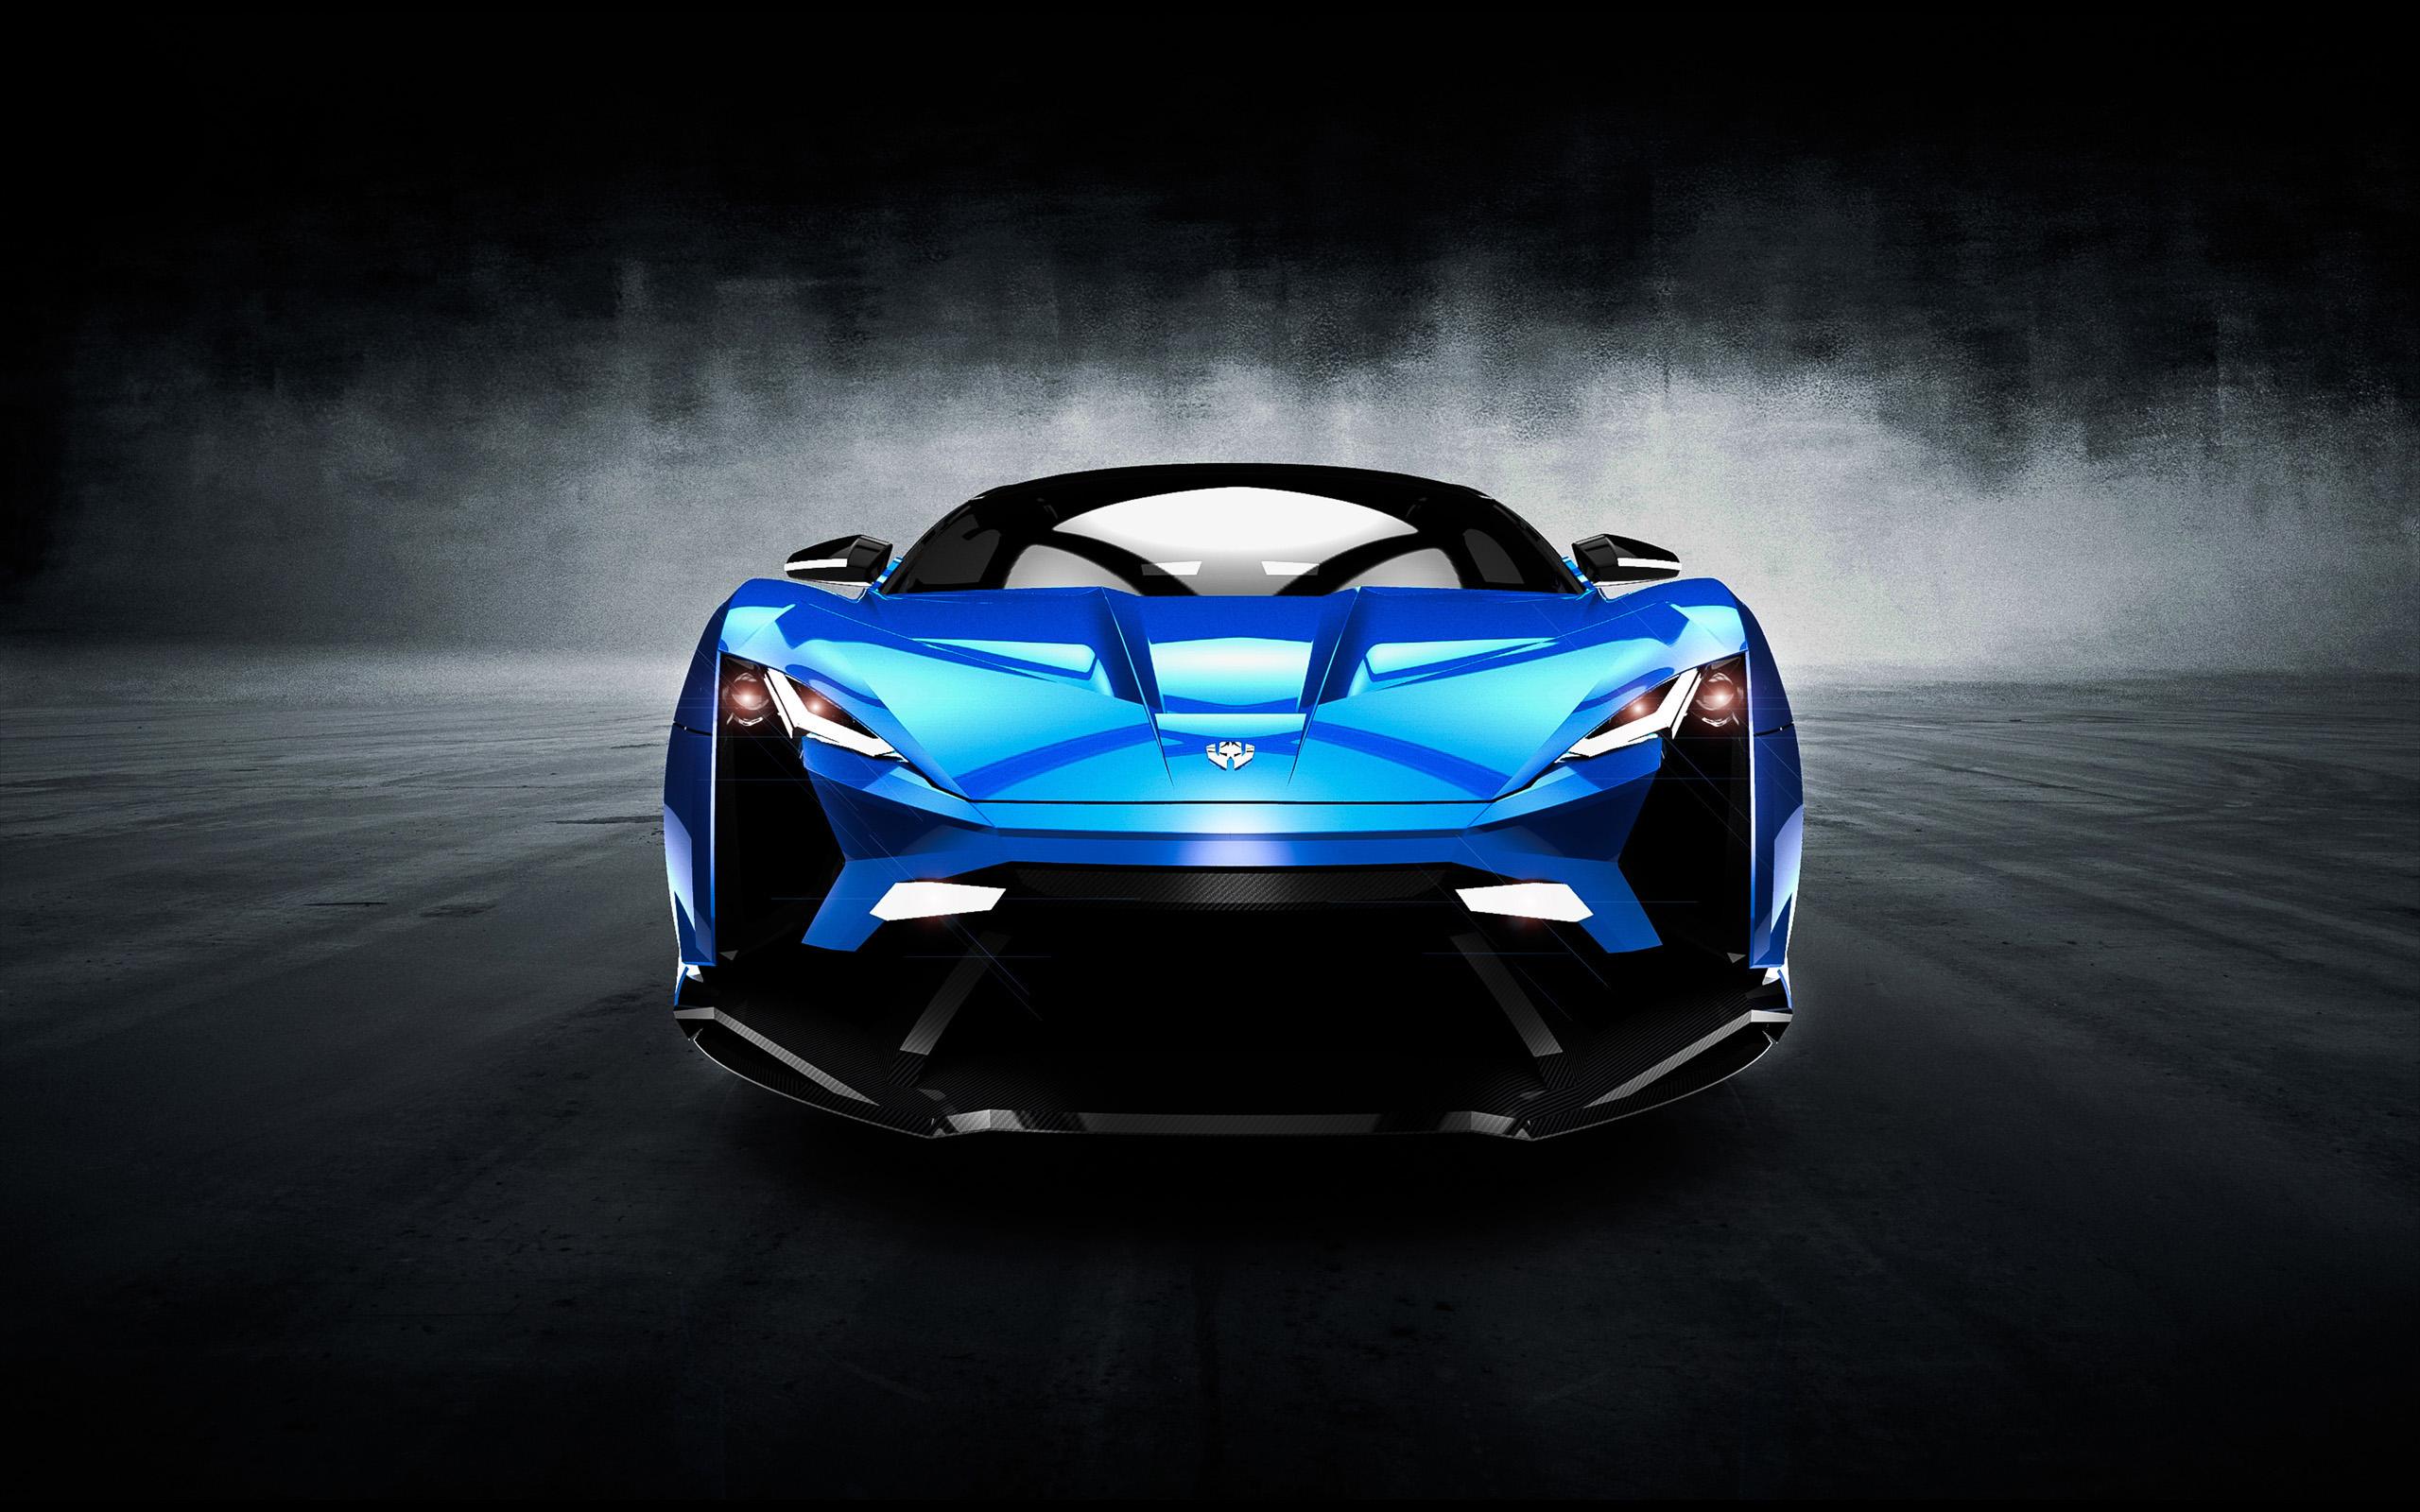 Motors wallpapers photos and desktop backgrounds up to 8k w motors lykan supersport 2015 wallpaper voltagebd Image collections